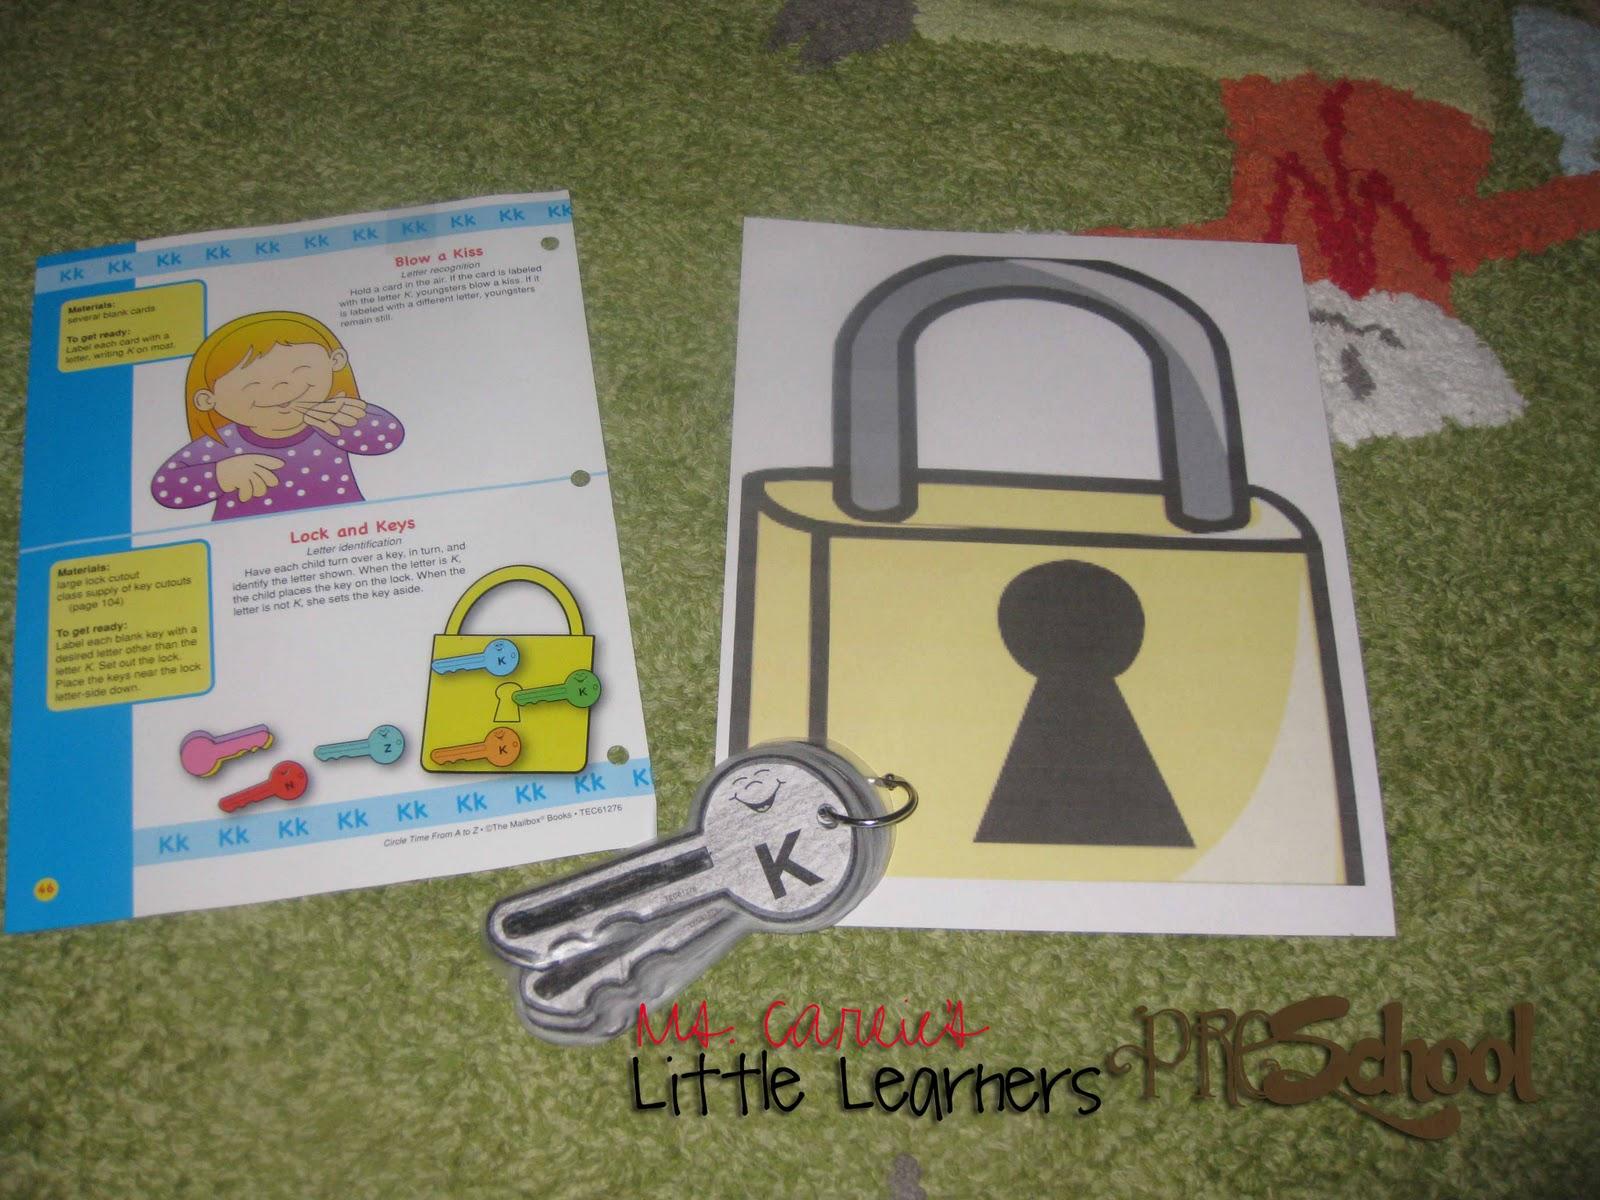 http://1.bp.blogspot.com/_opKrd4tacDg/TP6zT563HdI/AAAAAAAABiw/th90y2LsM4Q/s1600/Lock+%2526+Keys+%257Bk%257D.jpg